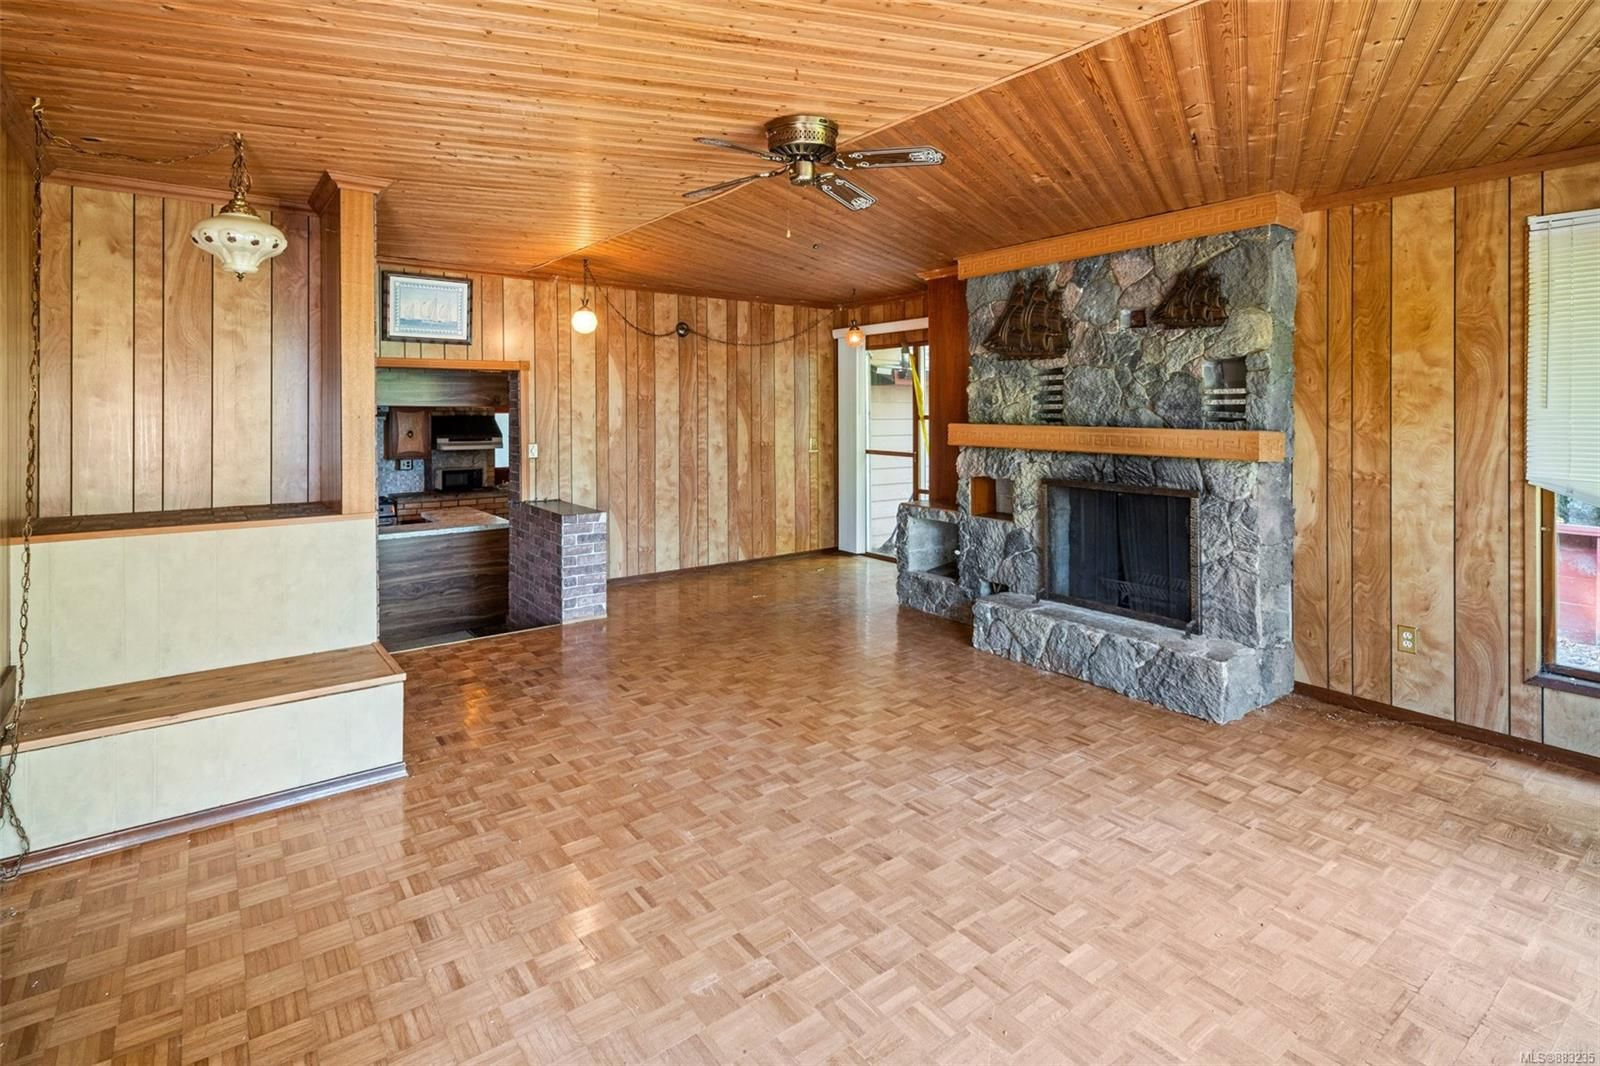 Photo 21: Photos: 6542 Thornett Rd in : Sk East Sooke House for sale (Sooke)  : MLS®# 883235